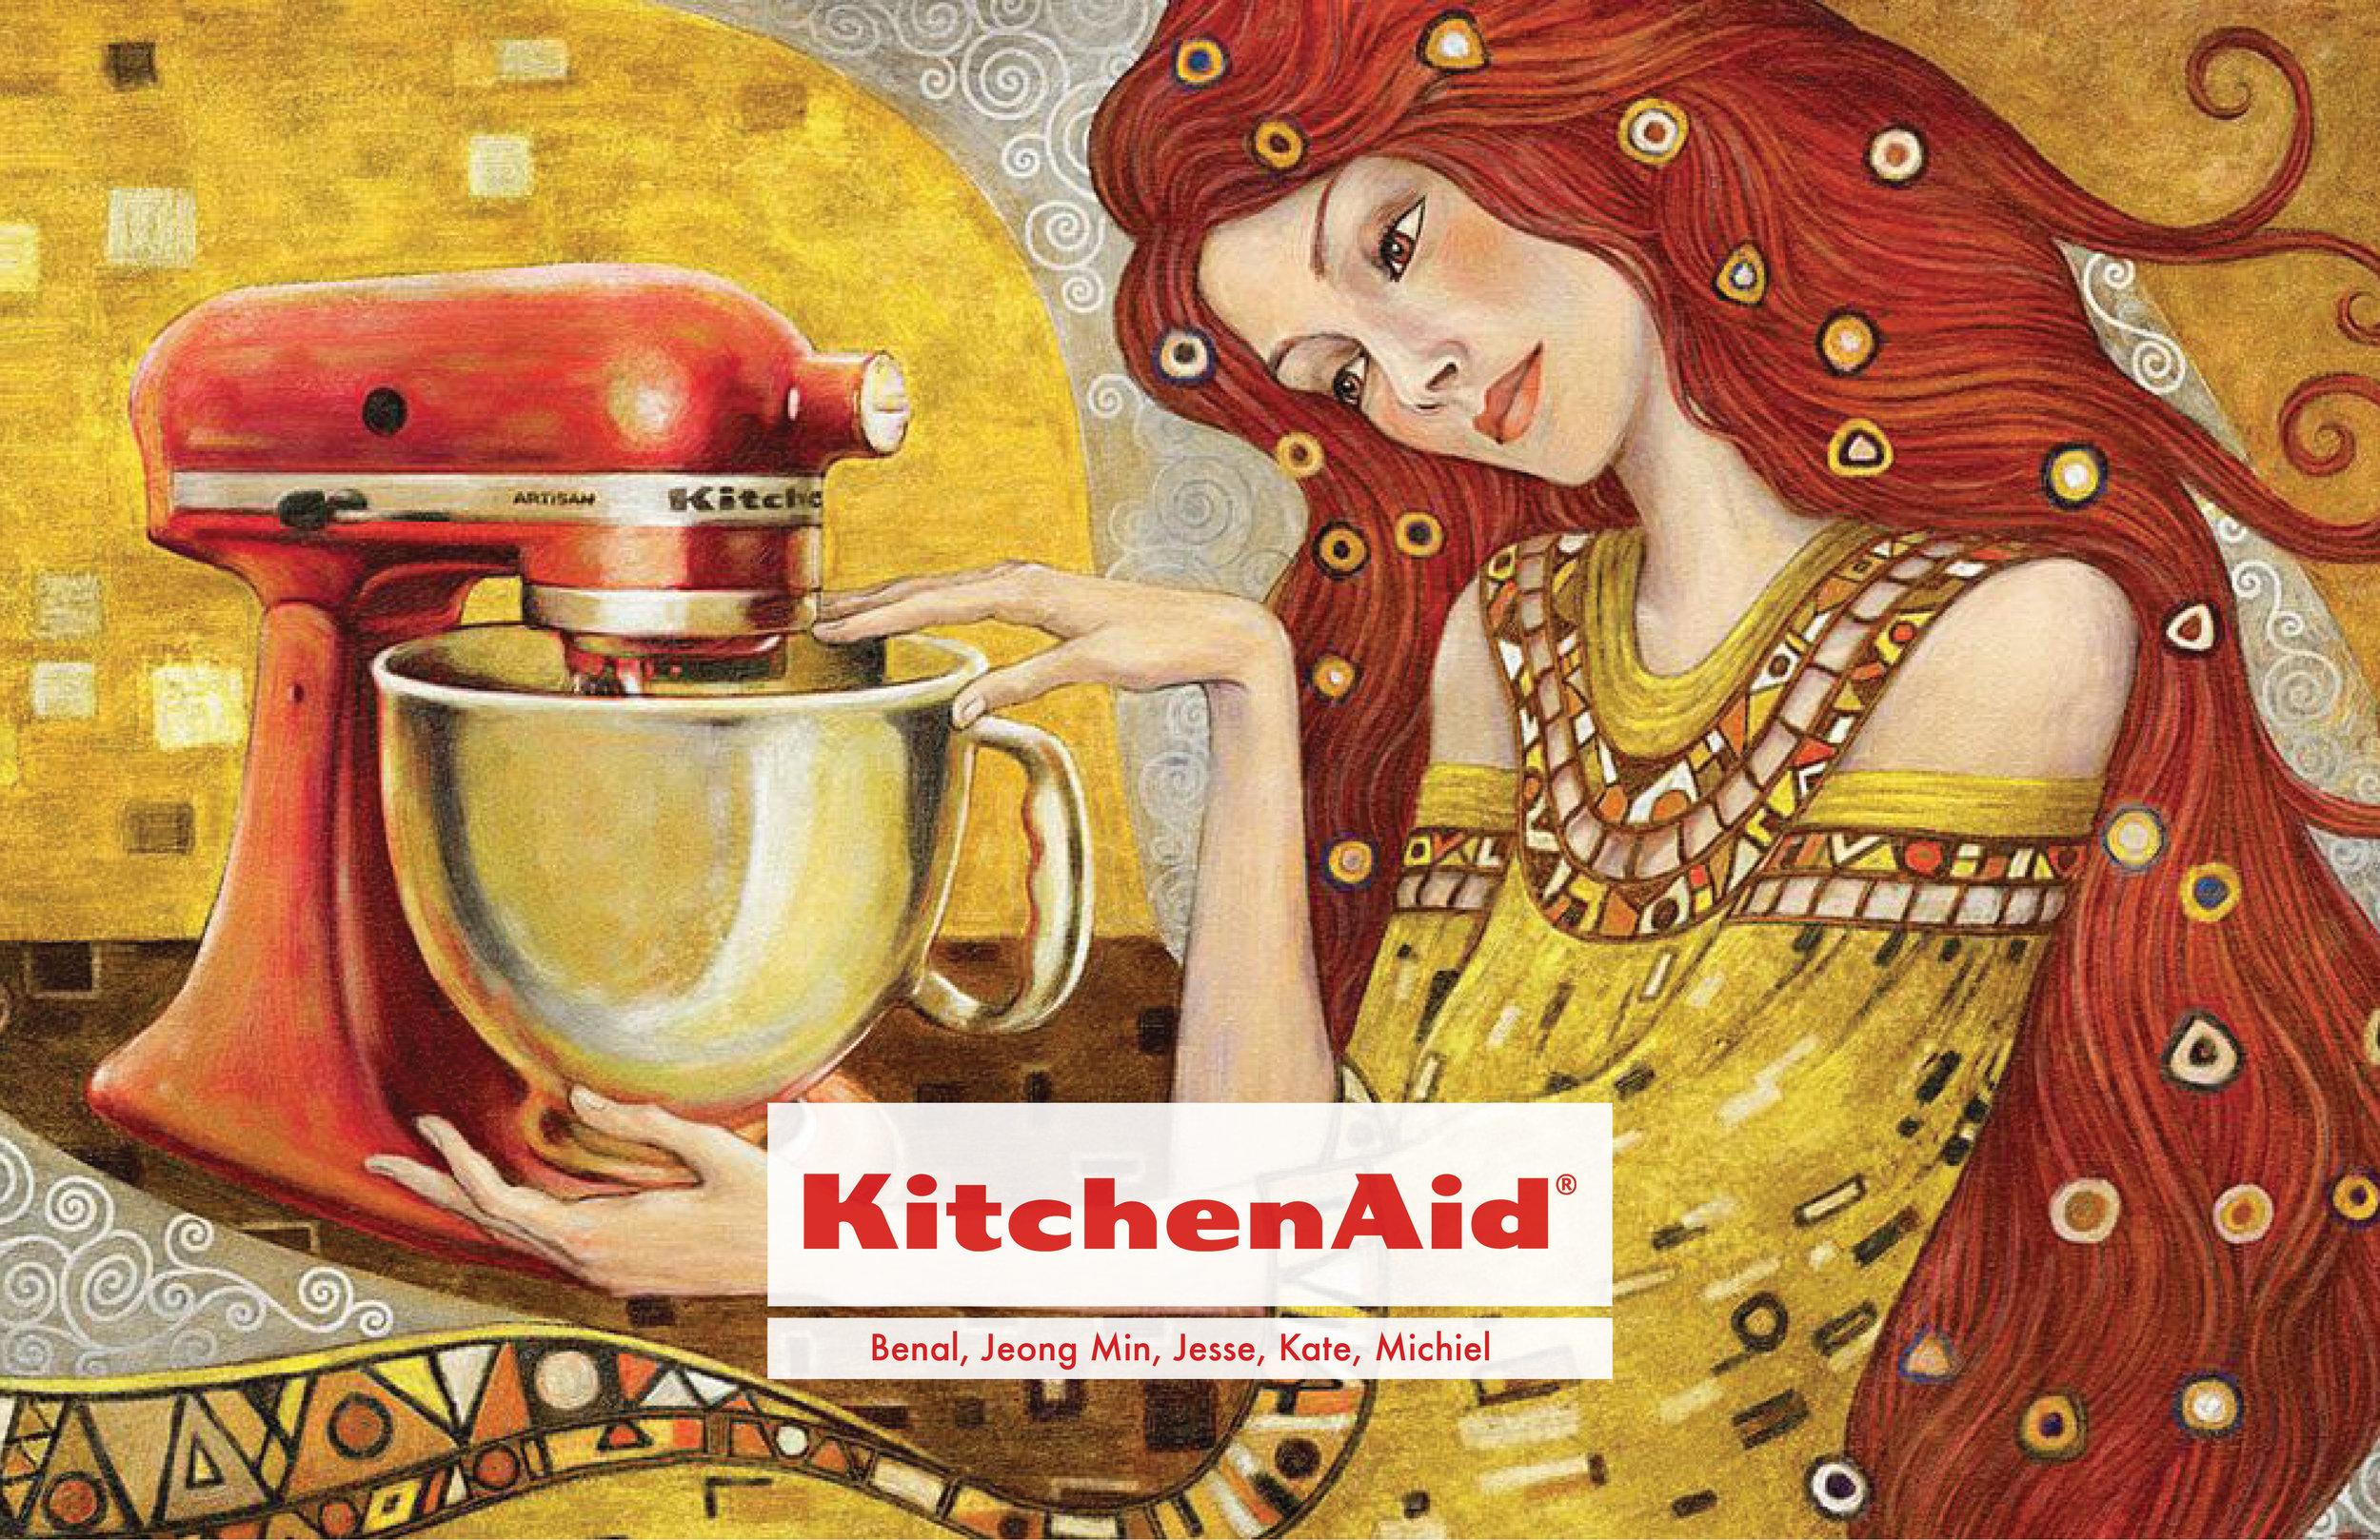 KitchenAid - Style Guide.jpg